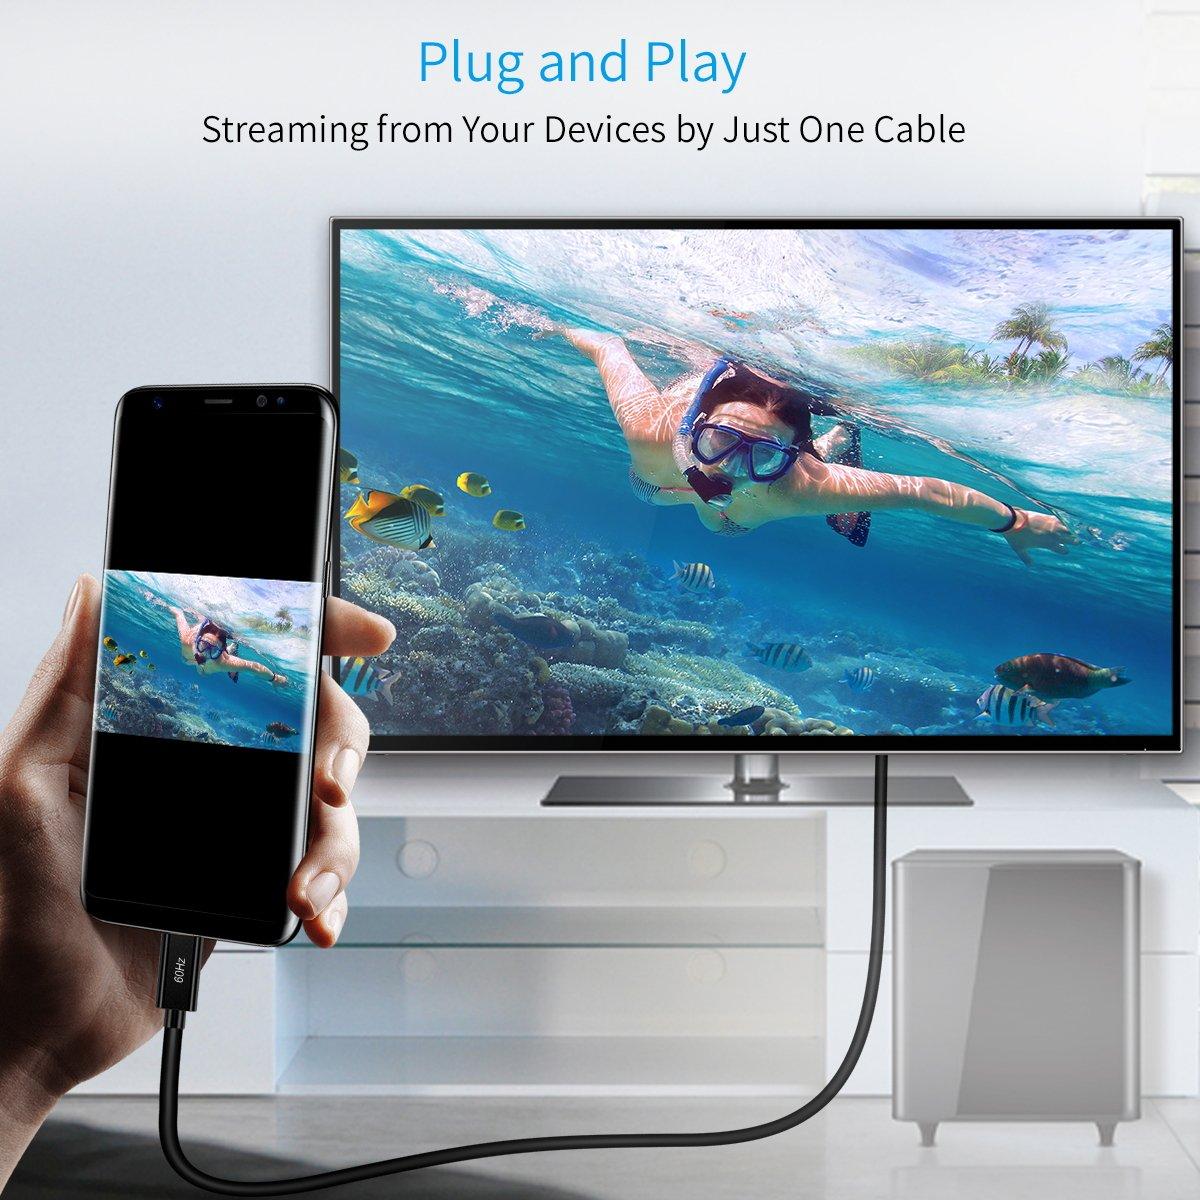 Amazon.com: CHOETECH USB C to HDMI Cable (4K@60Hz), 6ft/1.8m USB ...